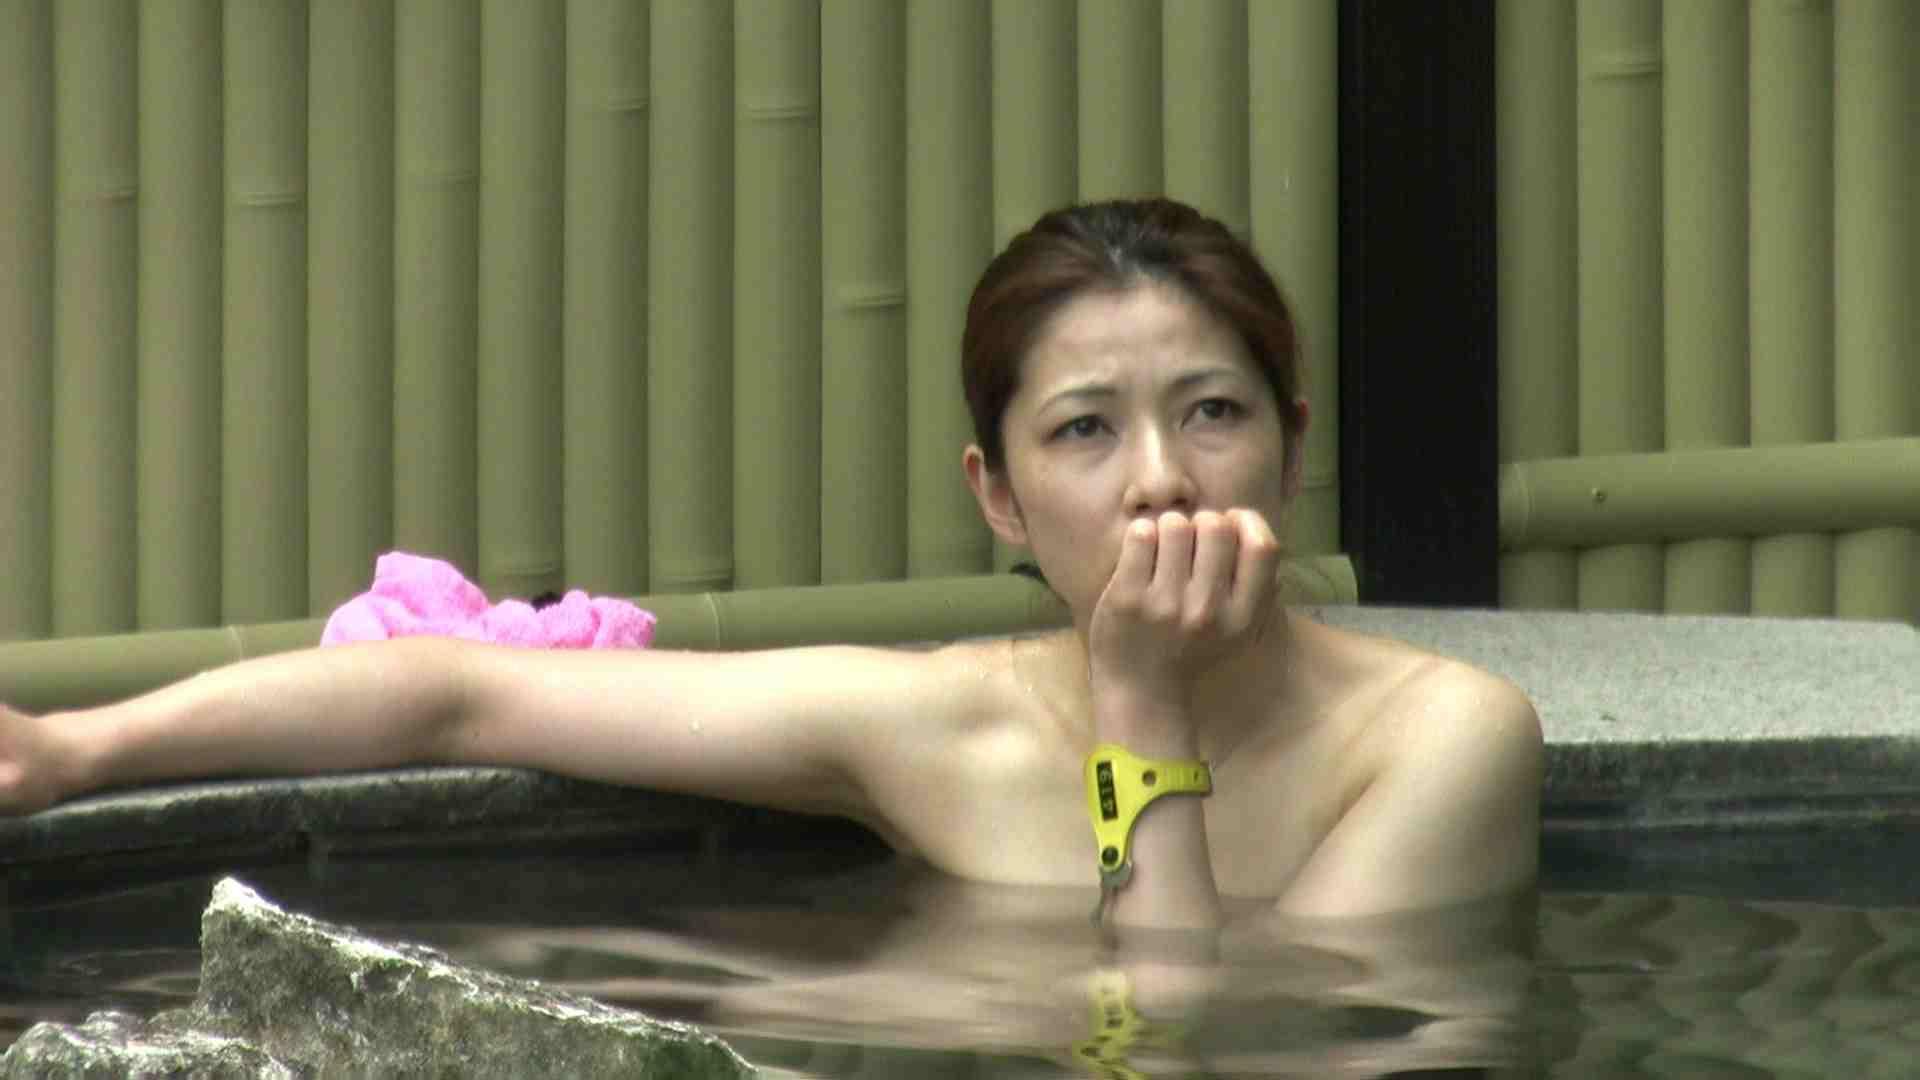 Aquaな露天風呂Vol.660 盗撮 すけべAV動画紹介 66枚 23